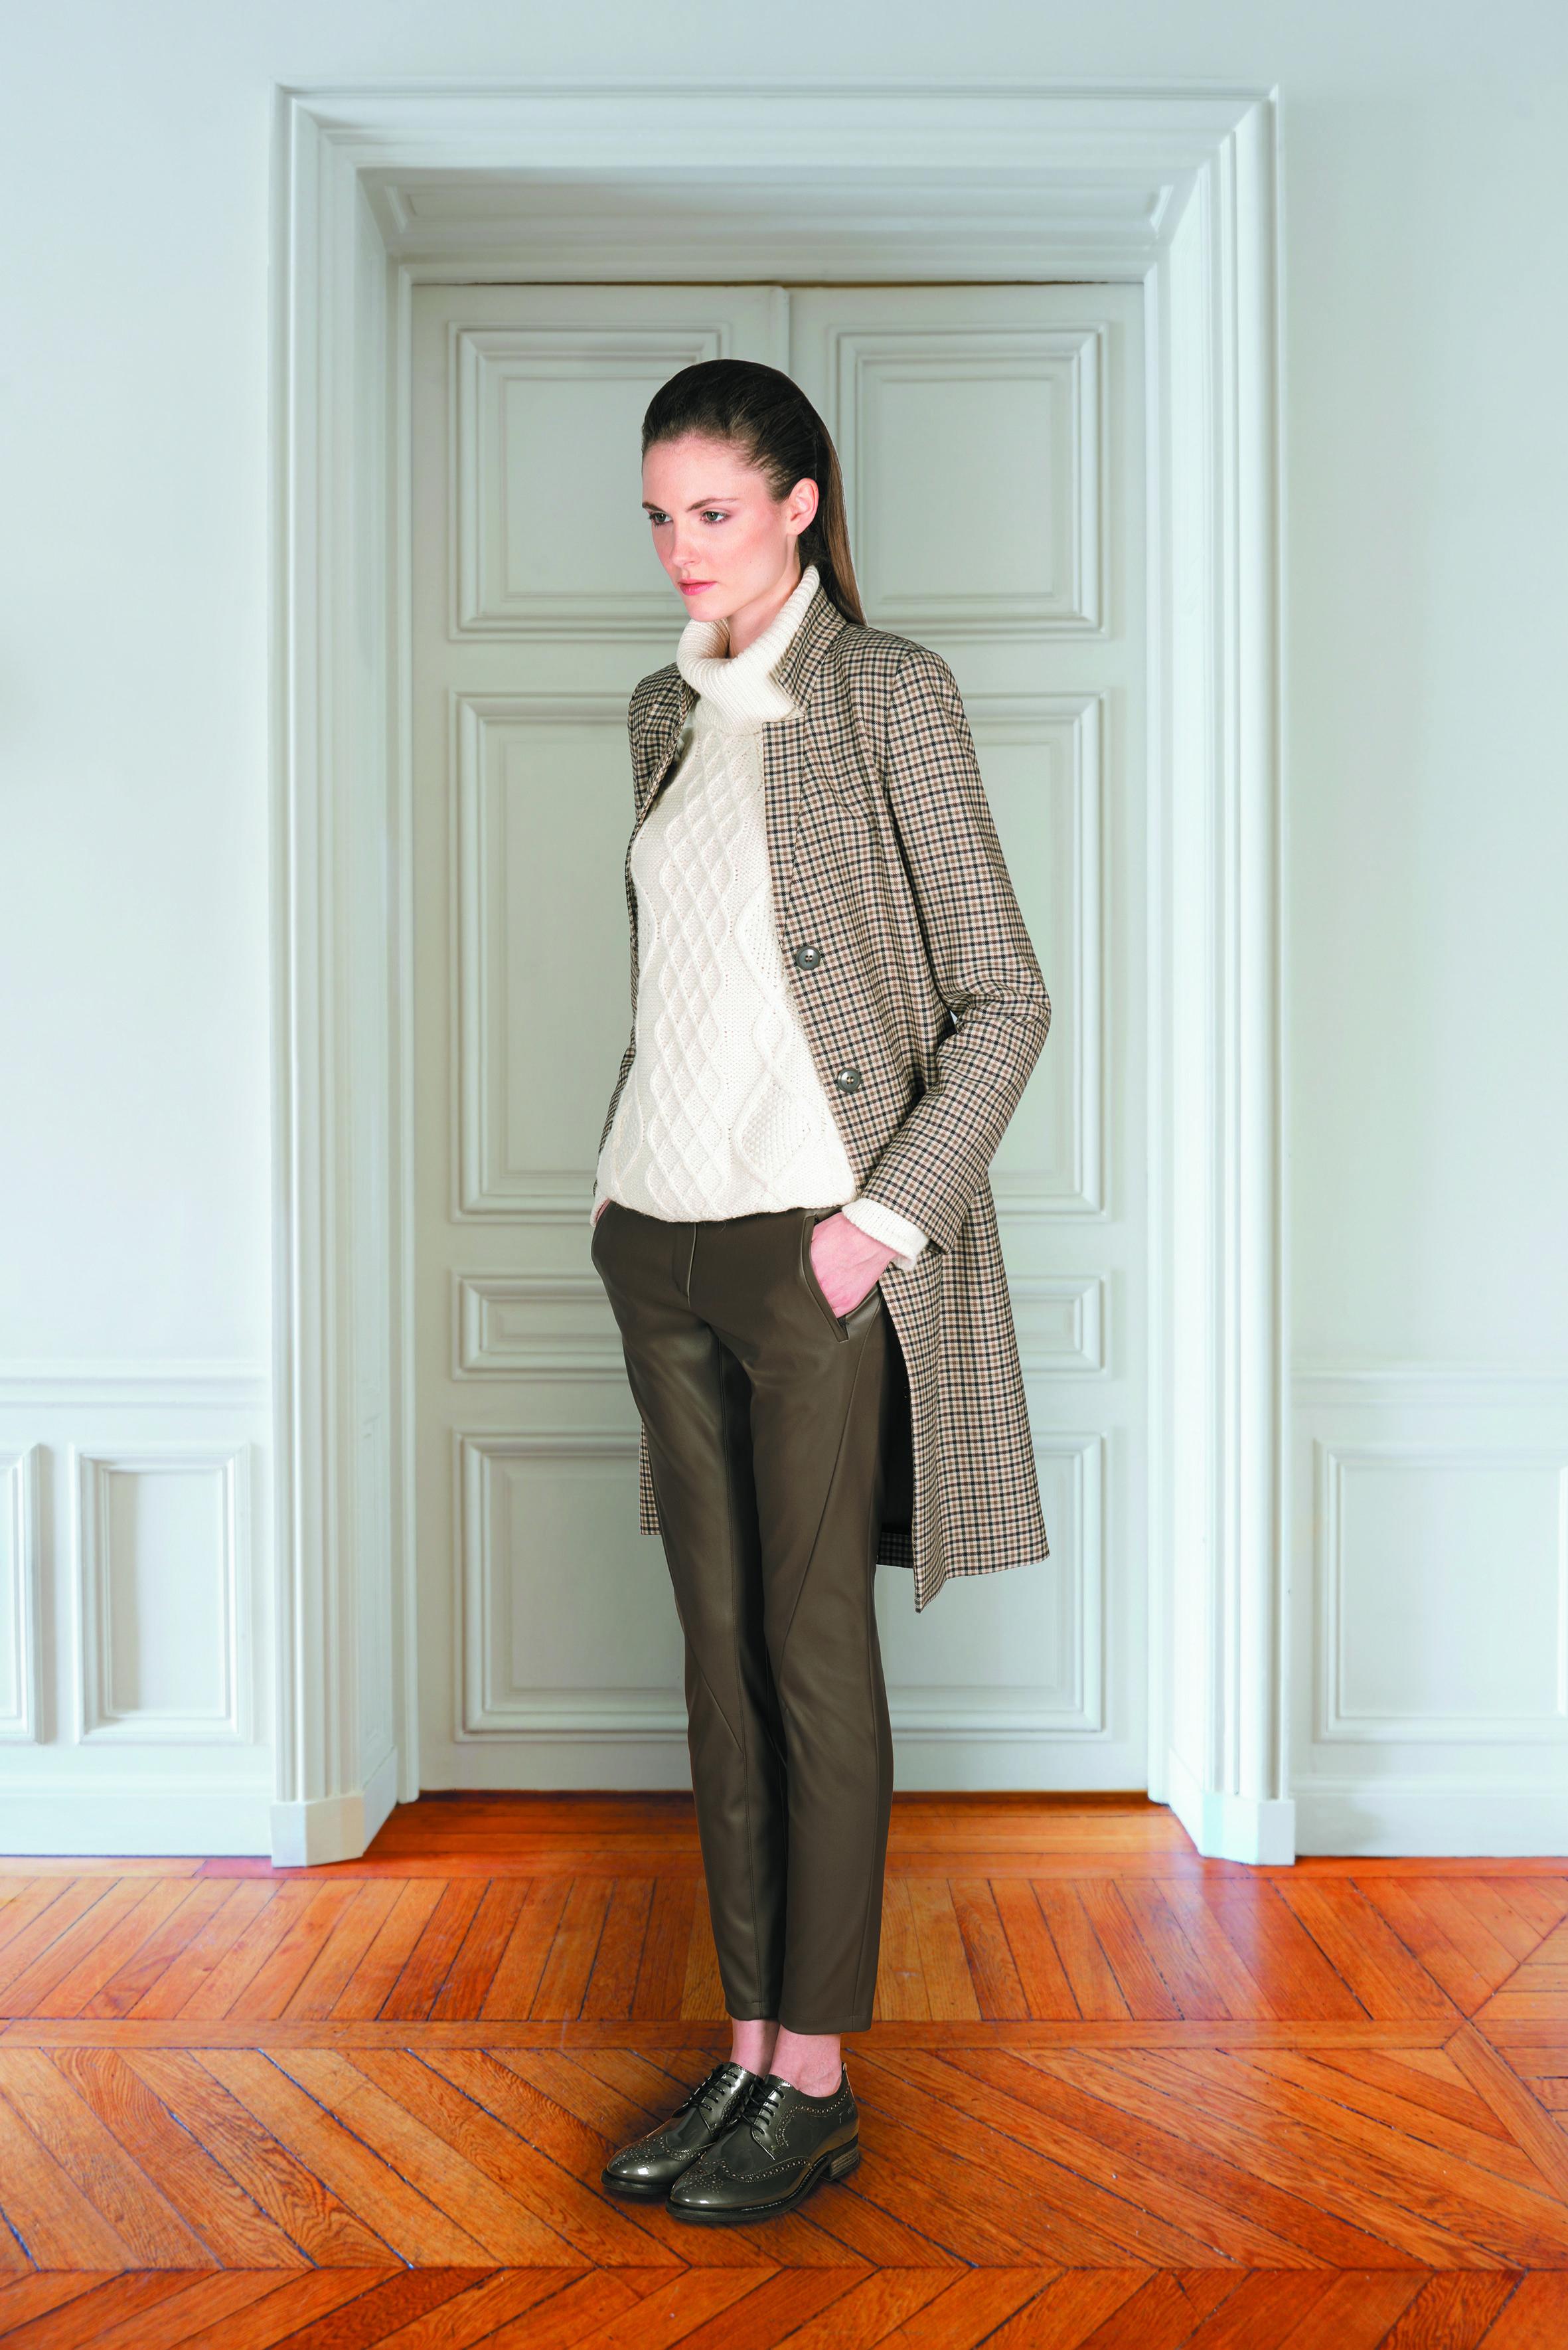 Pullover 'Elodie' Daniel Hechter Herbst   Winter Kollektion 2016